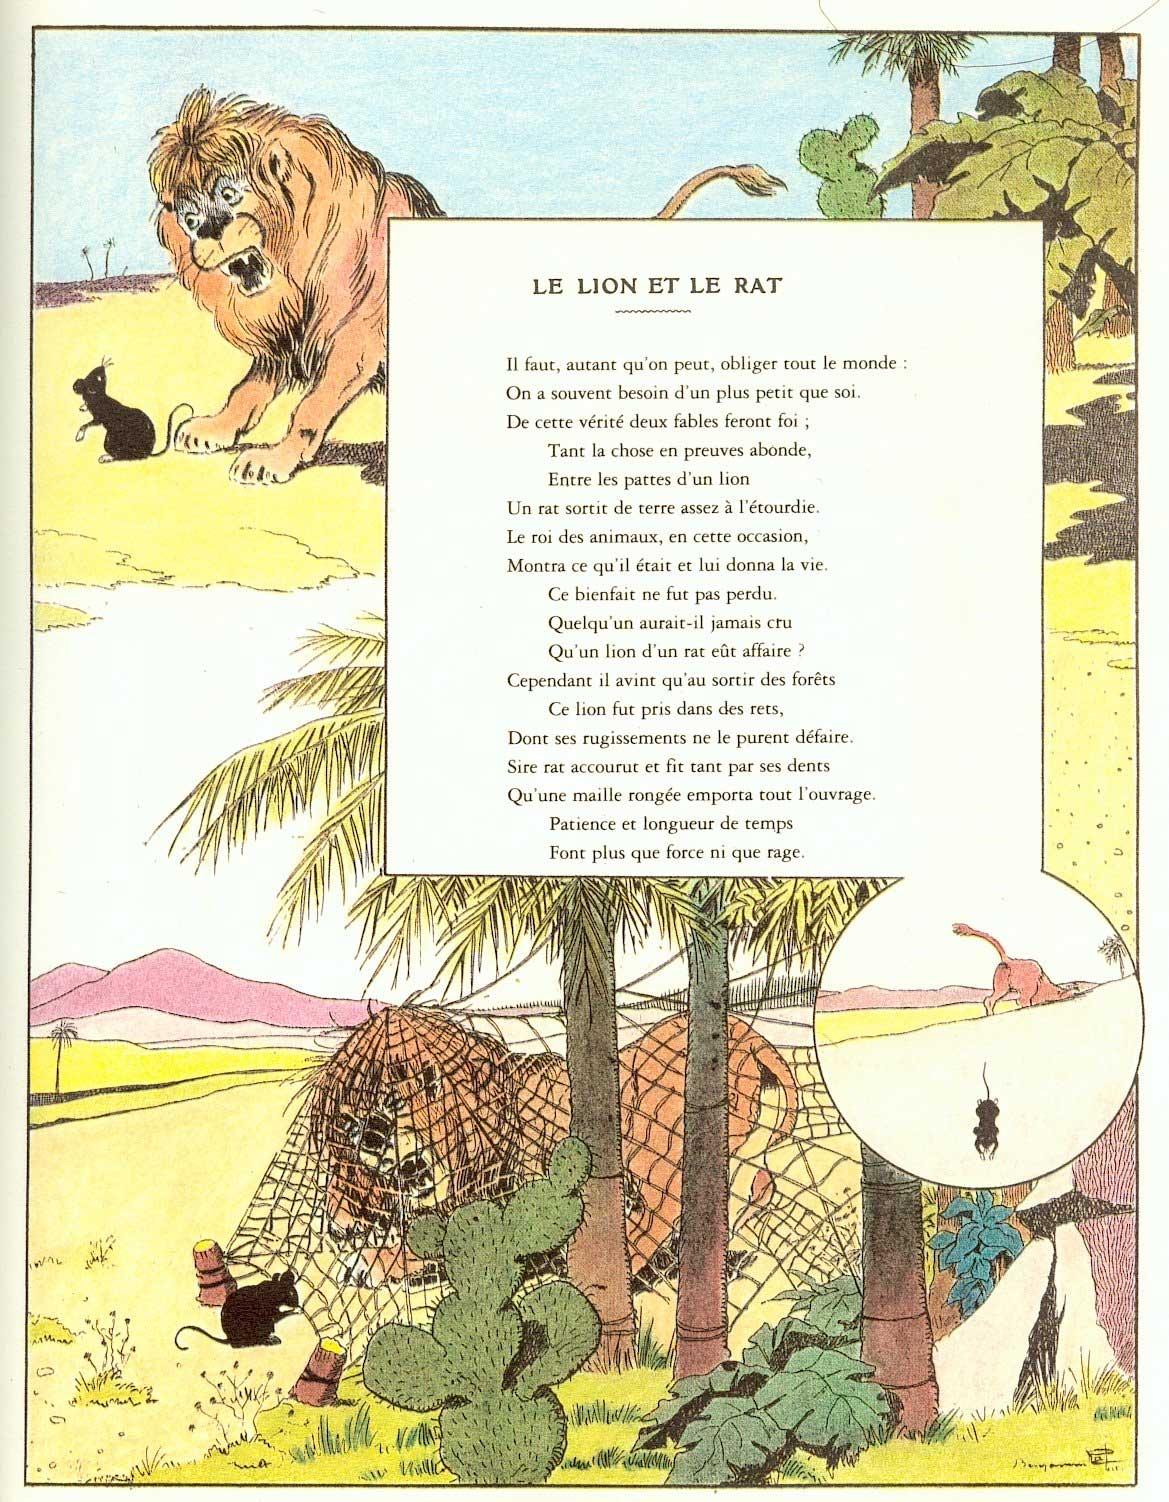 Le Lion Et Le Rat Analyse : analyse, Analyse, Texte